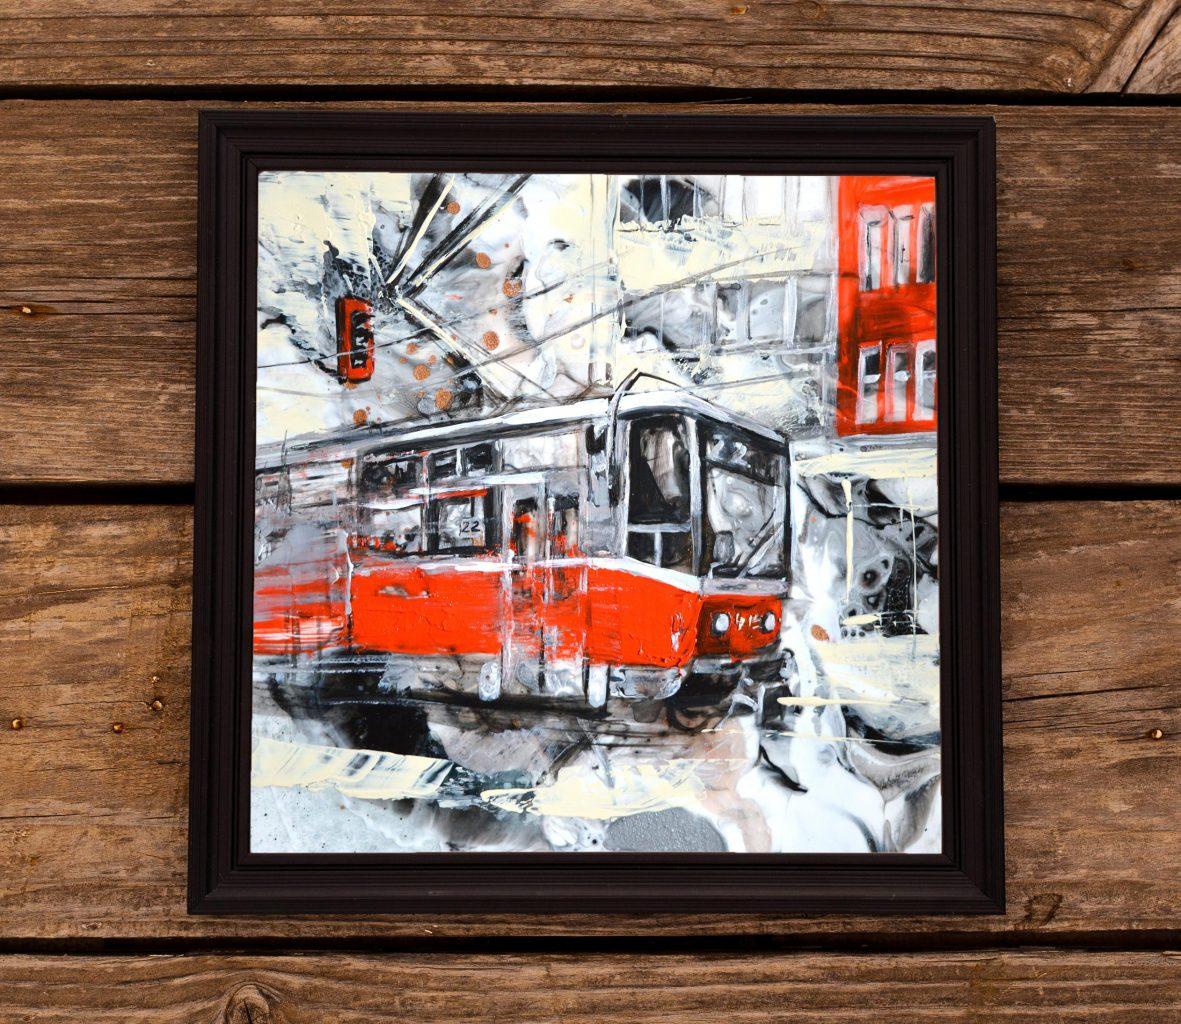 Urban Painting: Sofia Tram by Milena Gaytandzhieva